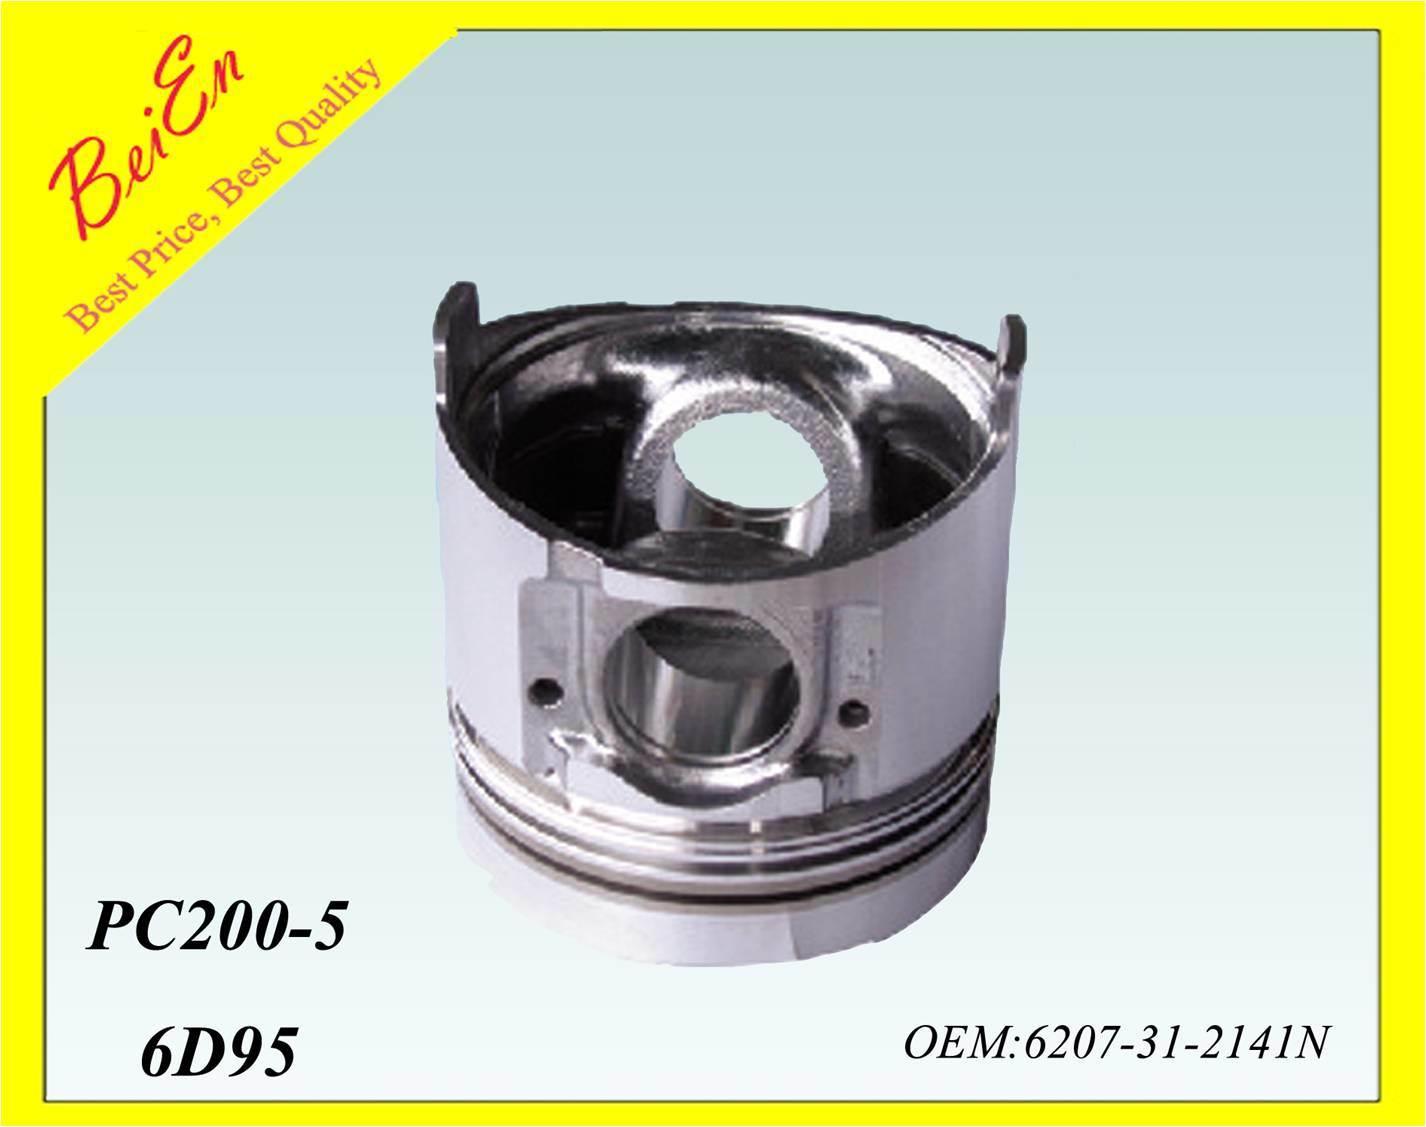 Piston for Excavator Engine PC200-5 (Part number: 6207-31-2141N)